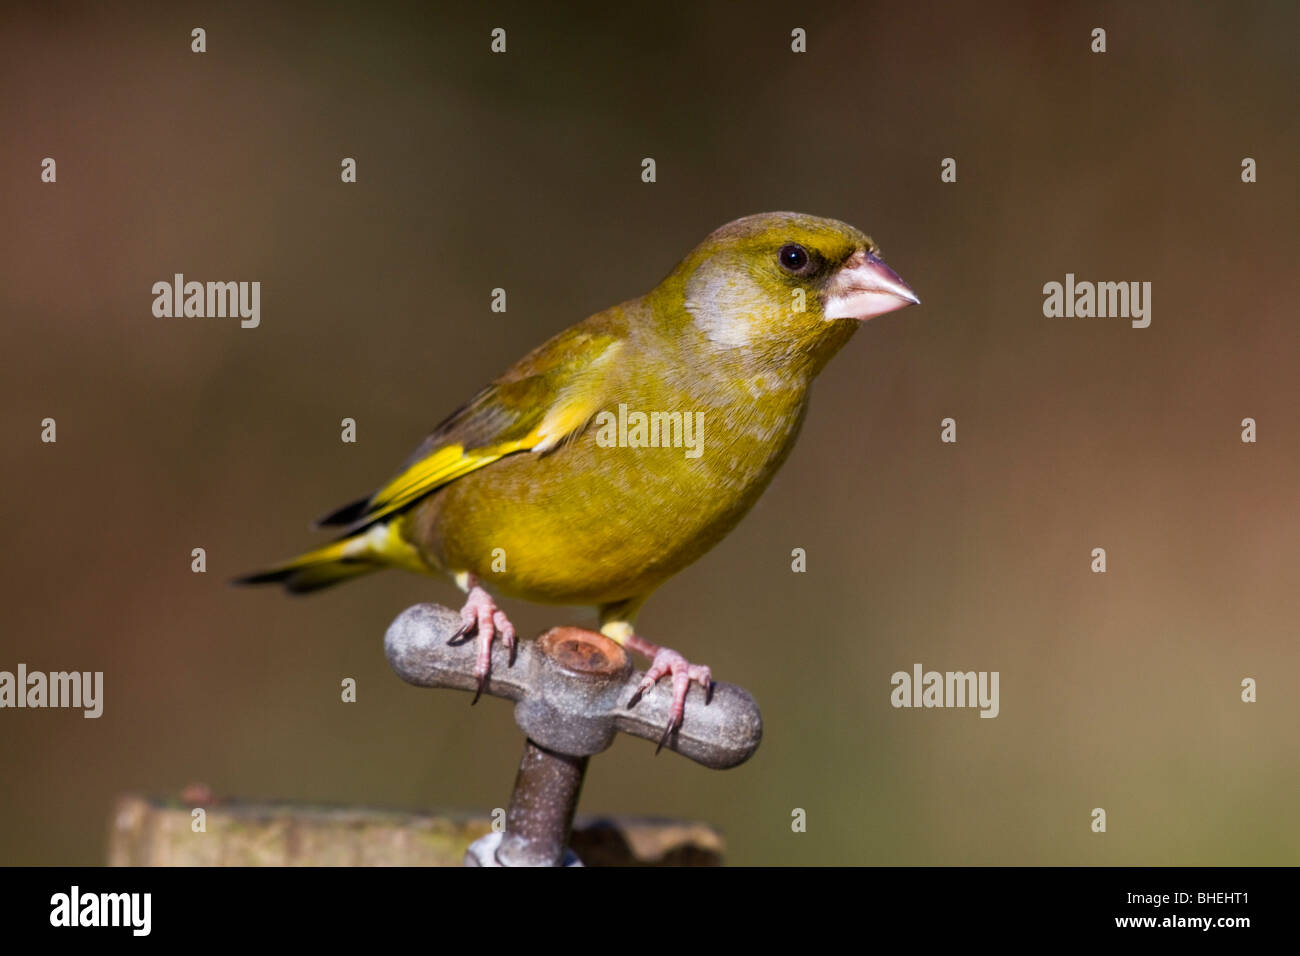 Greenfinch; Carduelis chloris; on garden tap - Stock Image